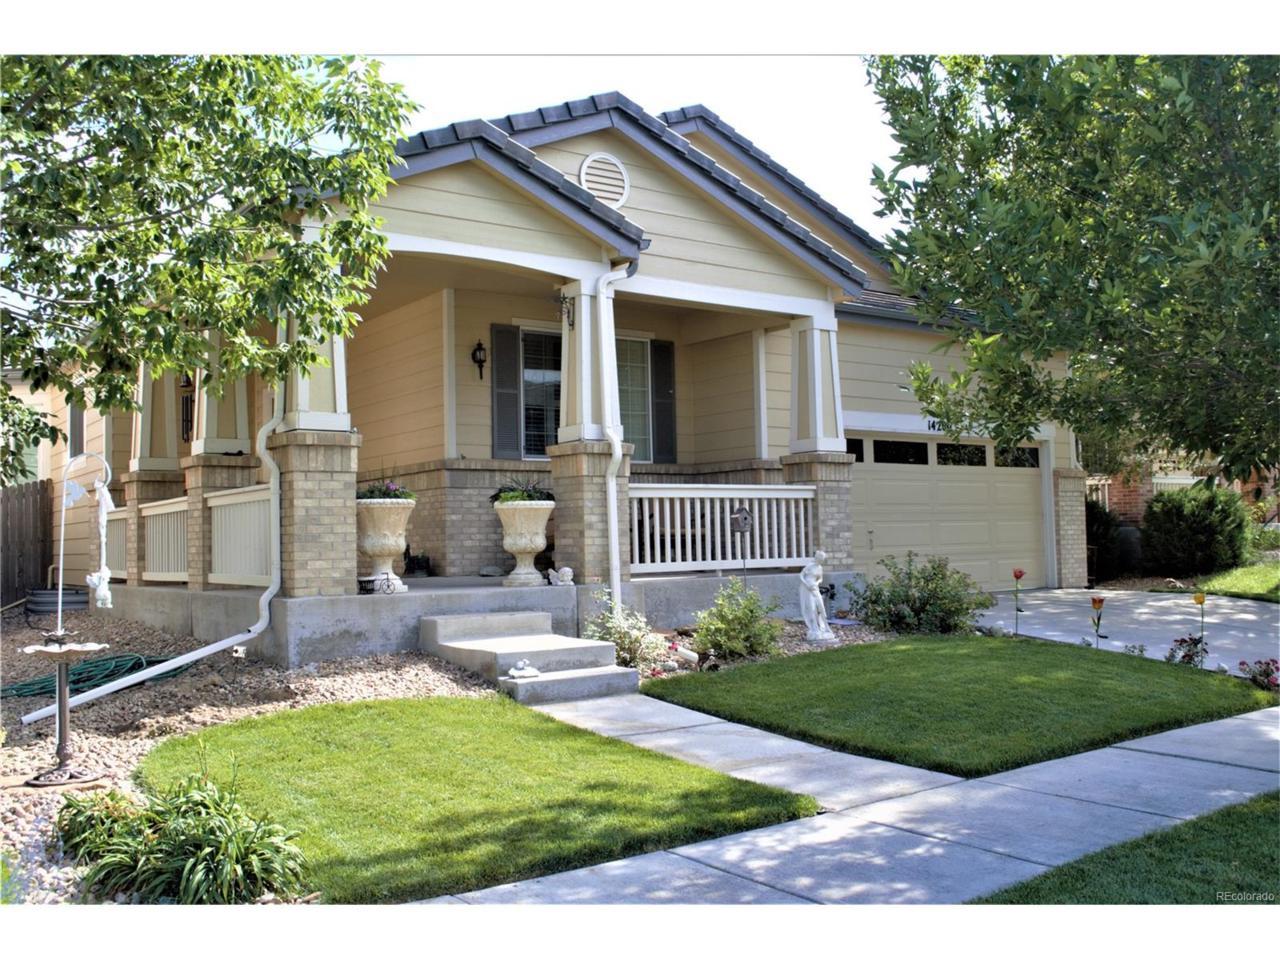 14200 E 102nd Avenue, Commerce City, CO 80022 (MLS #8019503) :: 8z Real Estate